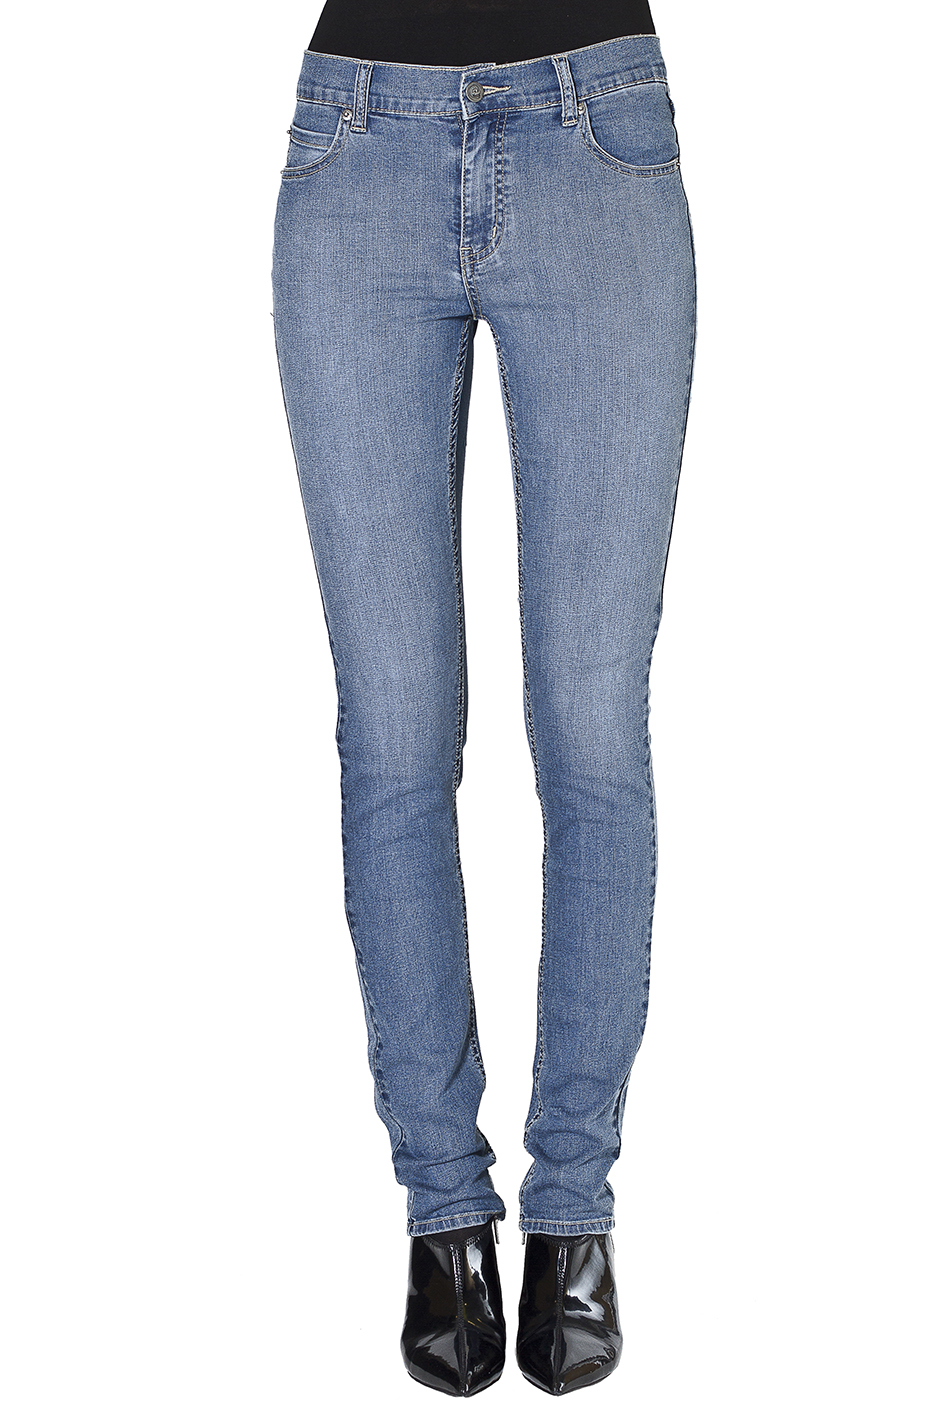 Tight Credit Light Blue | jeans | Cheapmonday.com